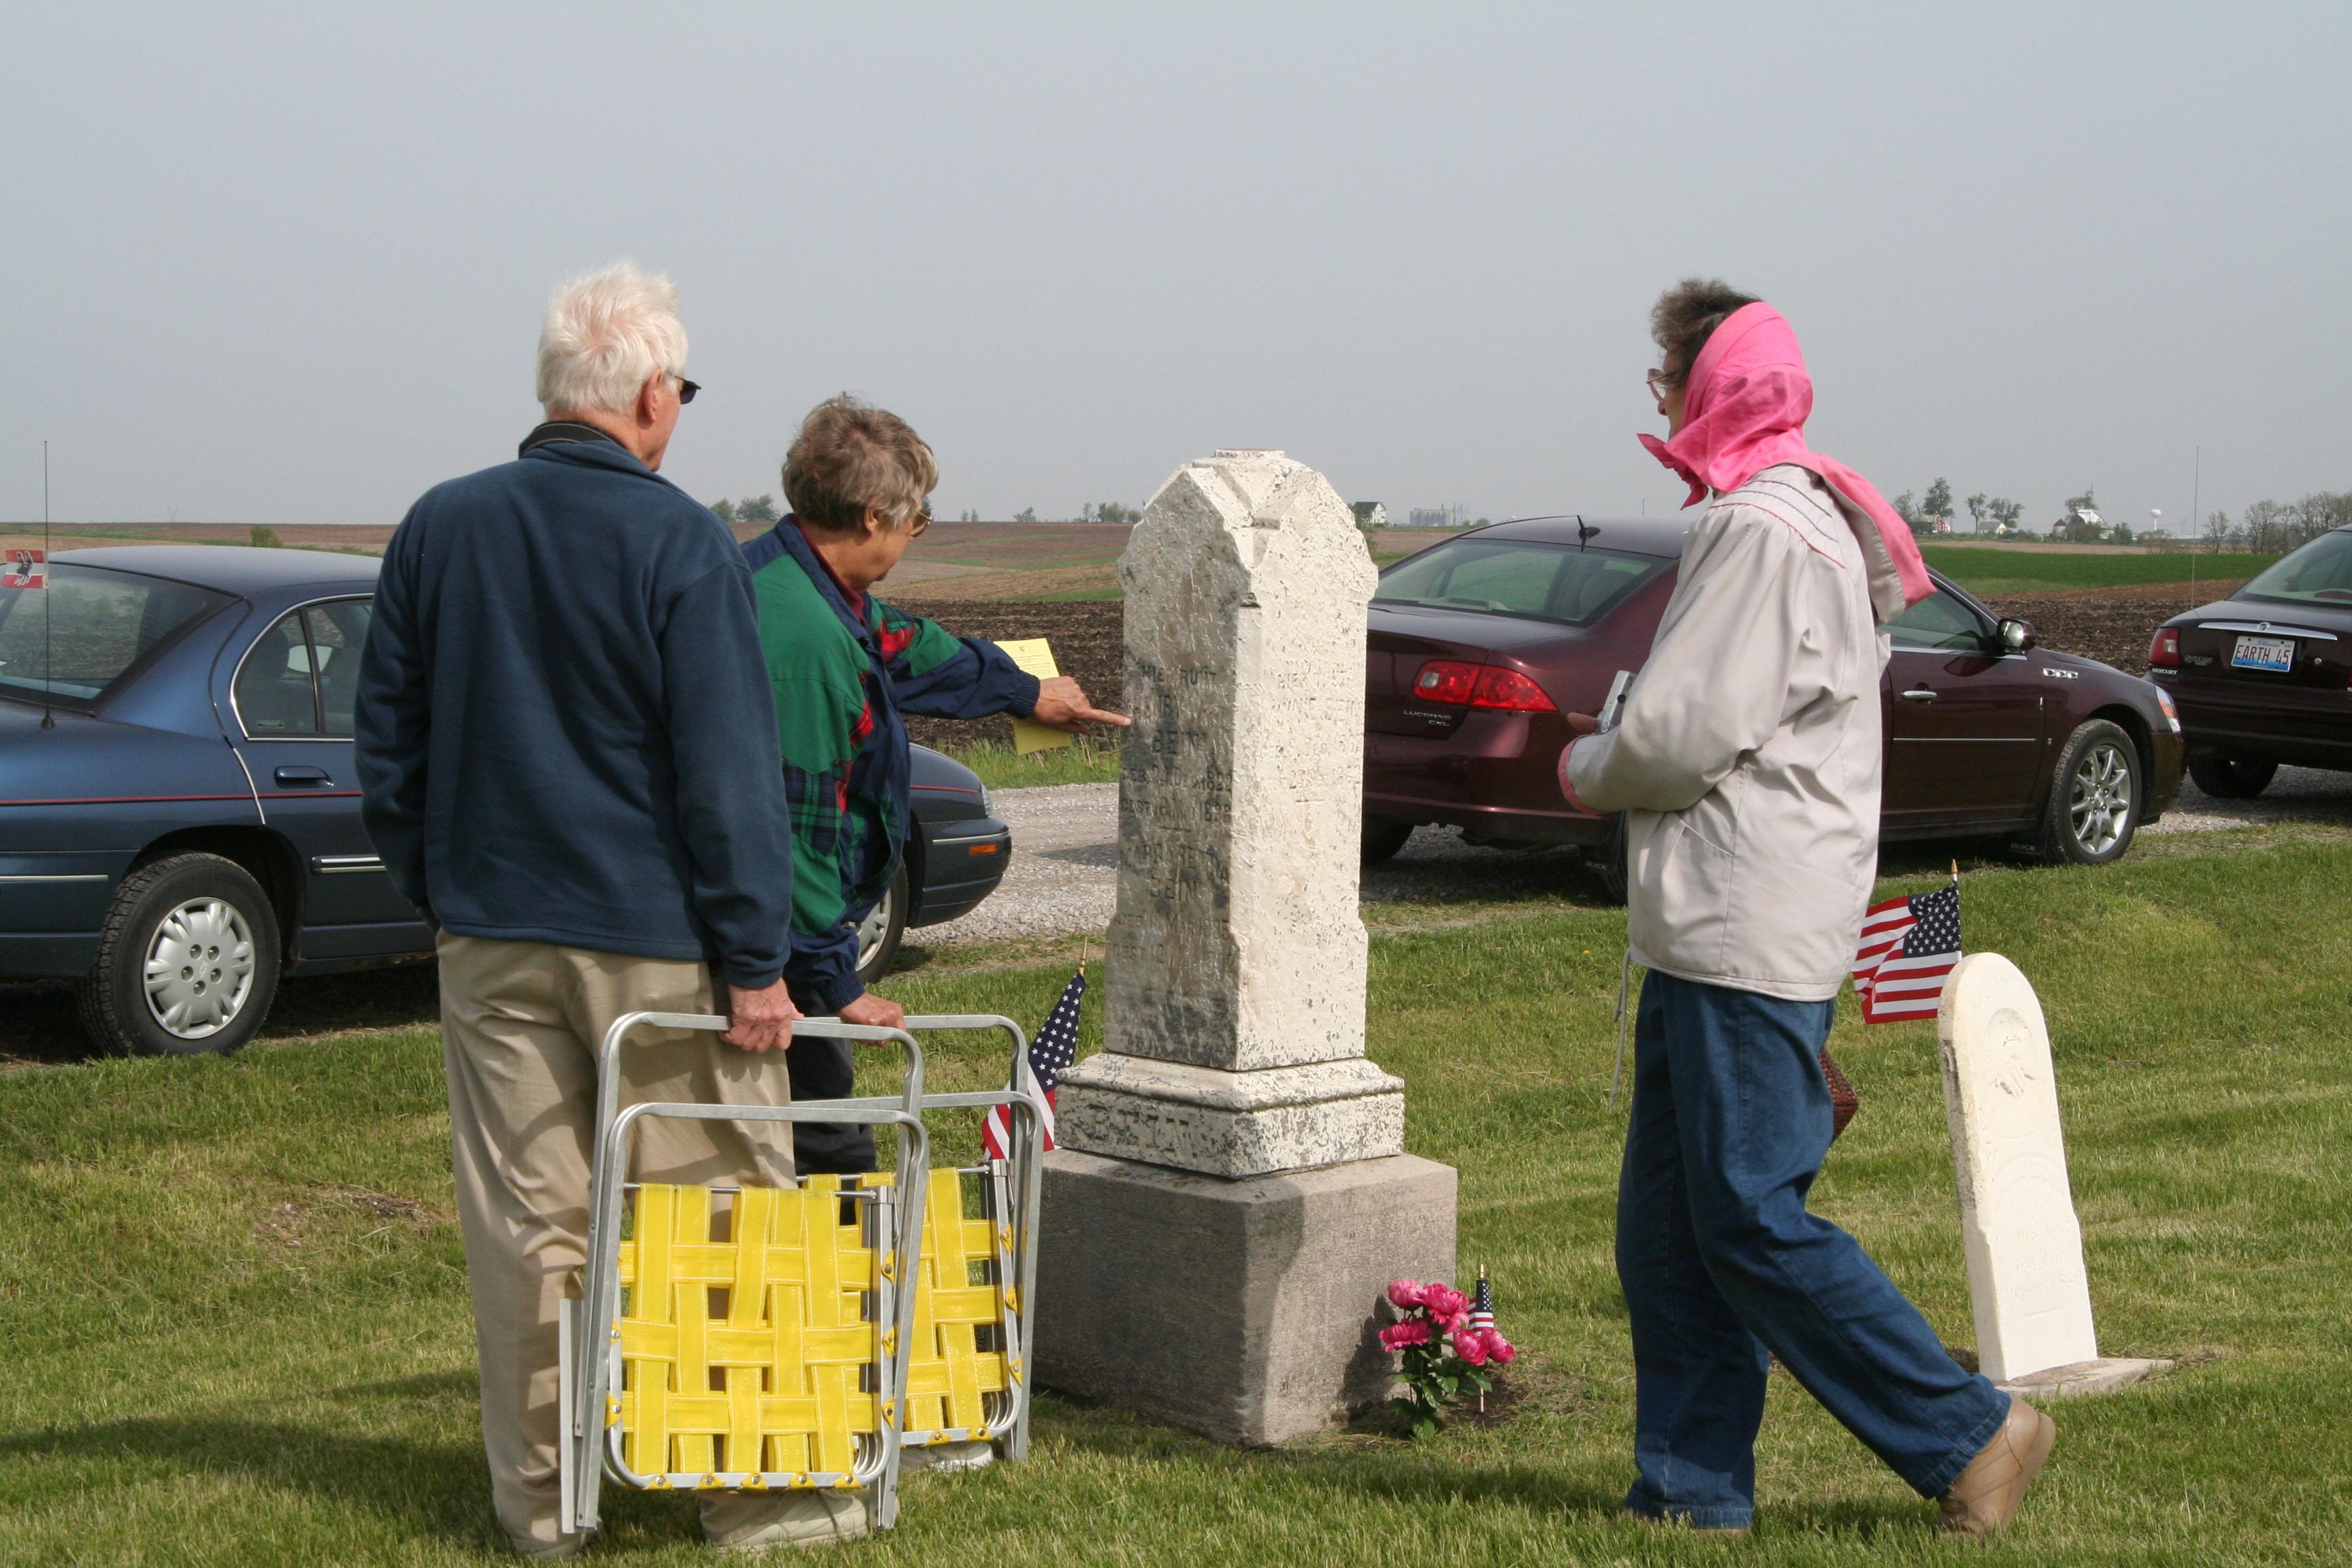 Kistenmacher Cemetery in Scott County, Iowa, in May 2008.